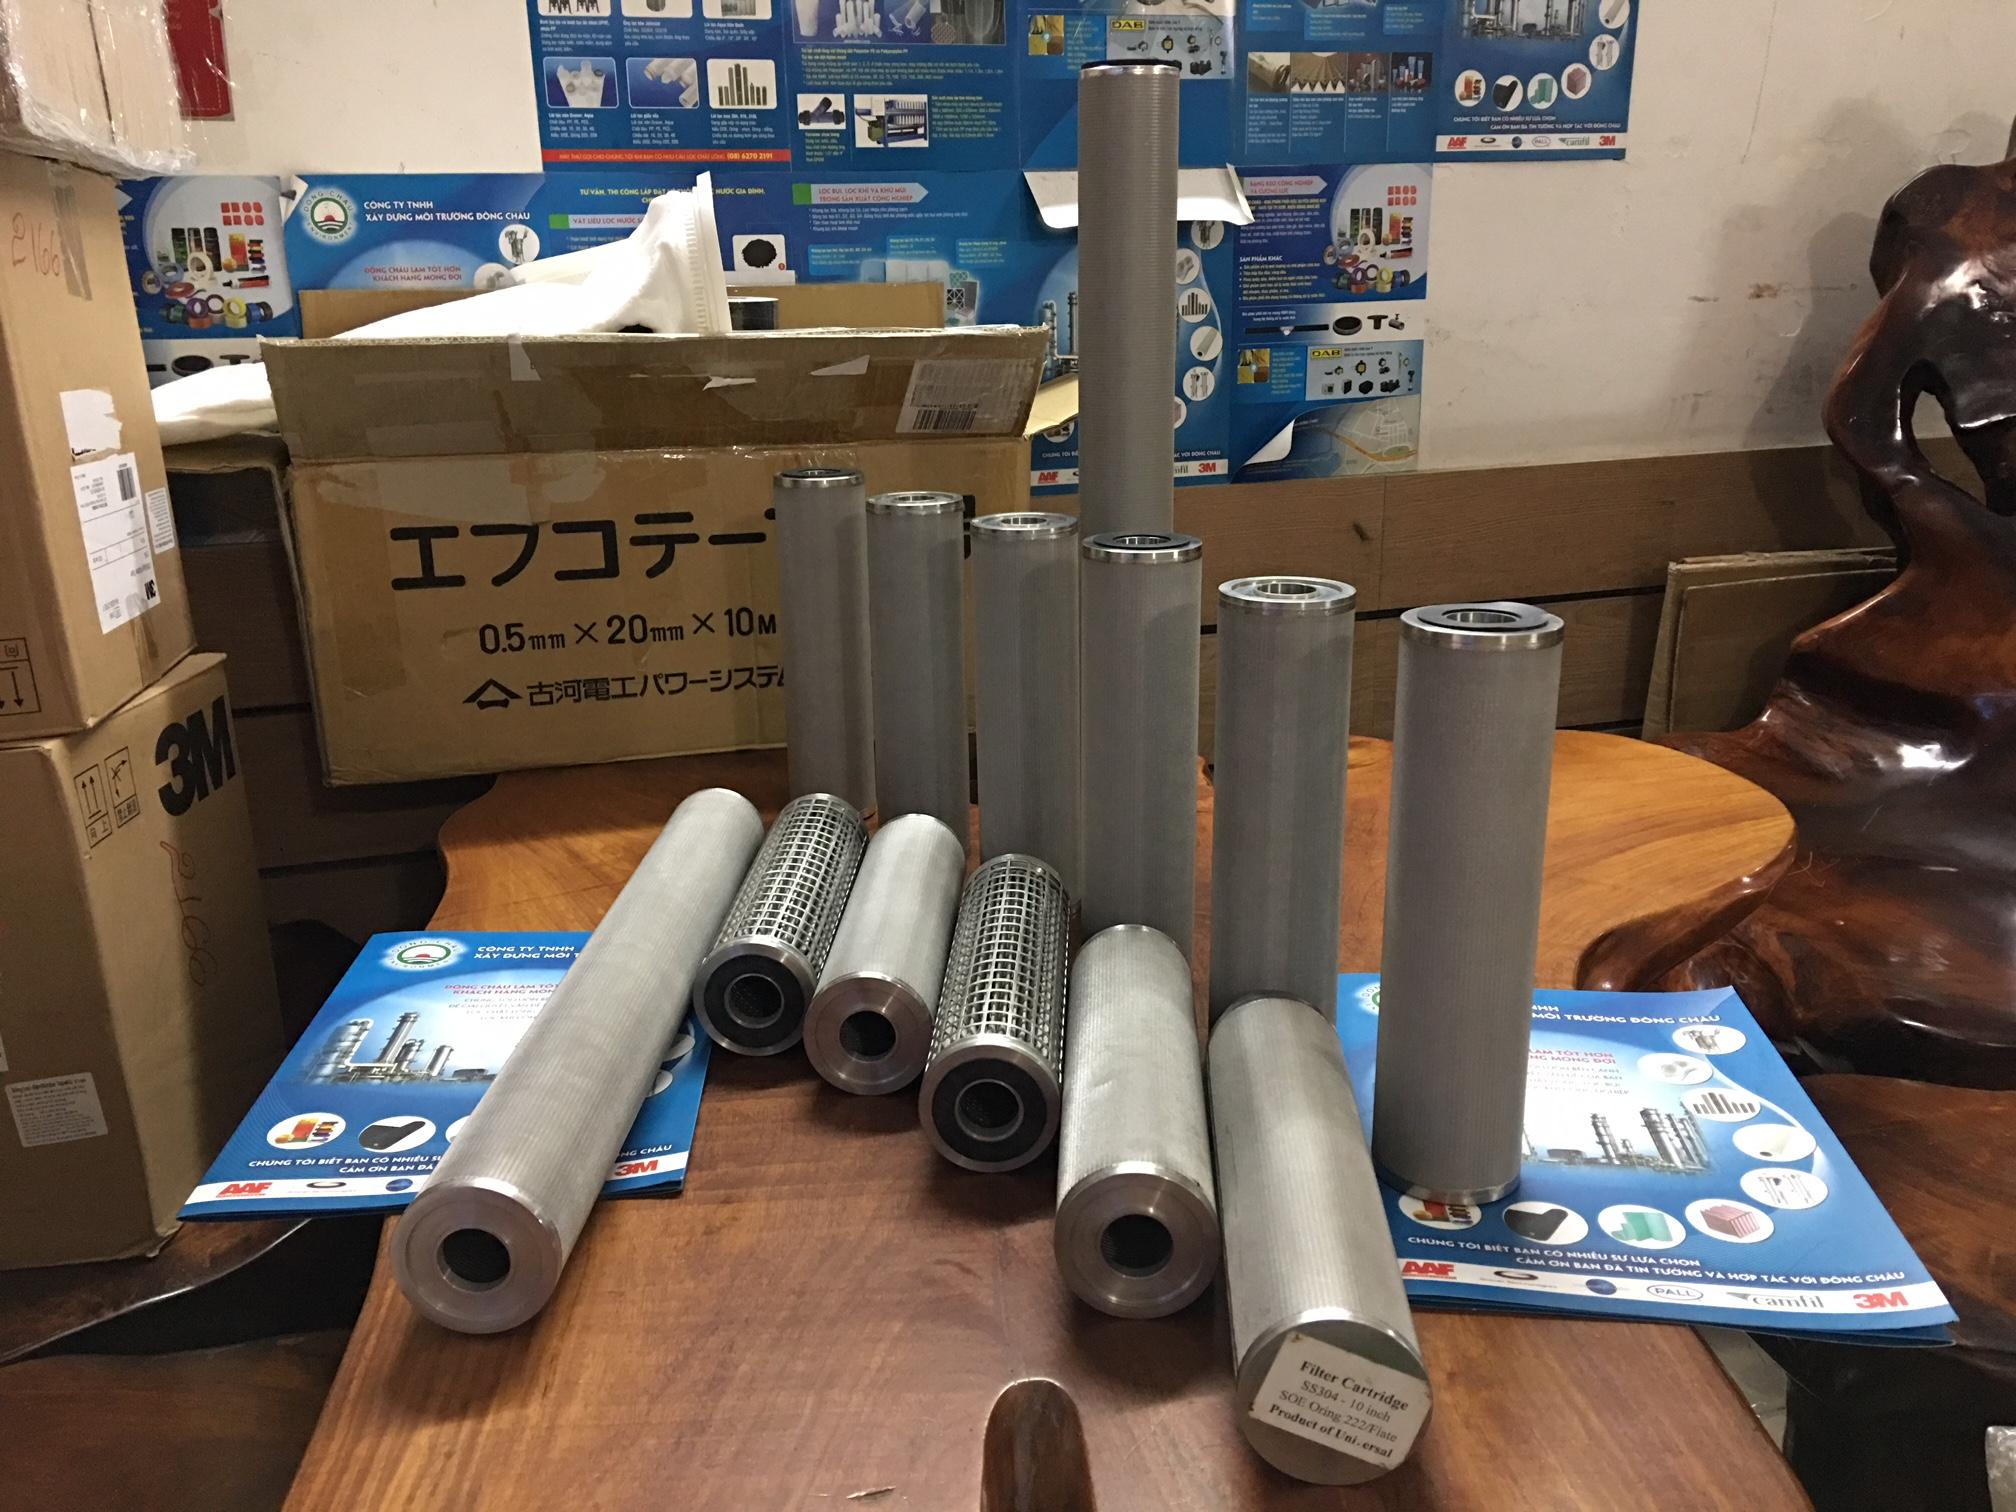 Lõi lọc inox 304 20 inch Universal